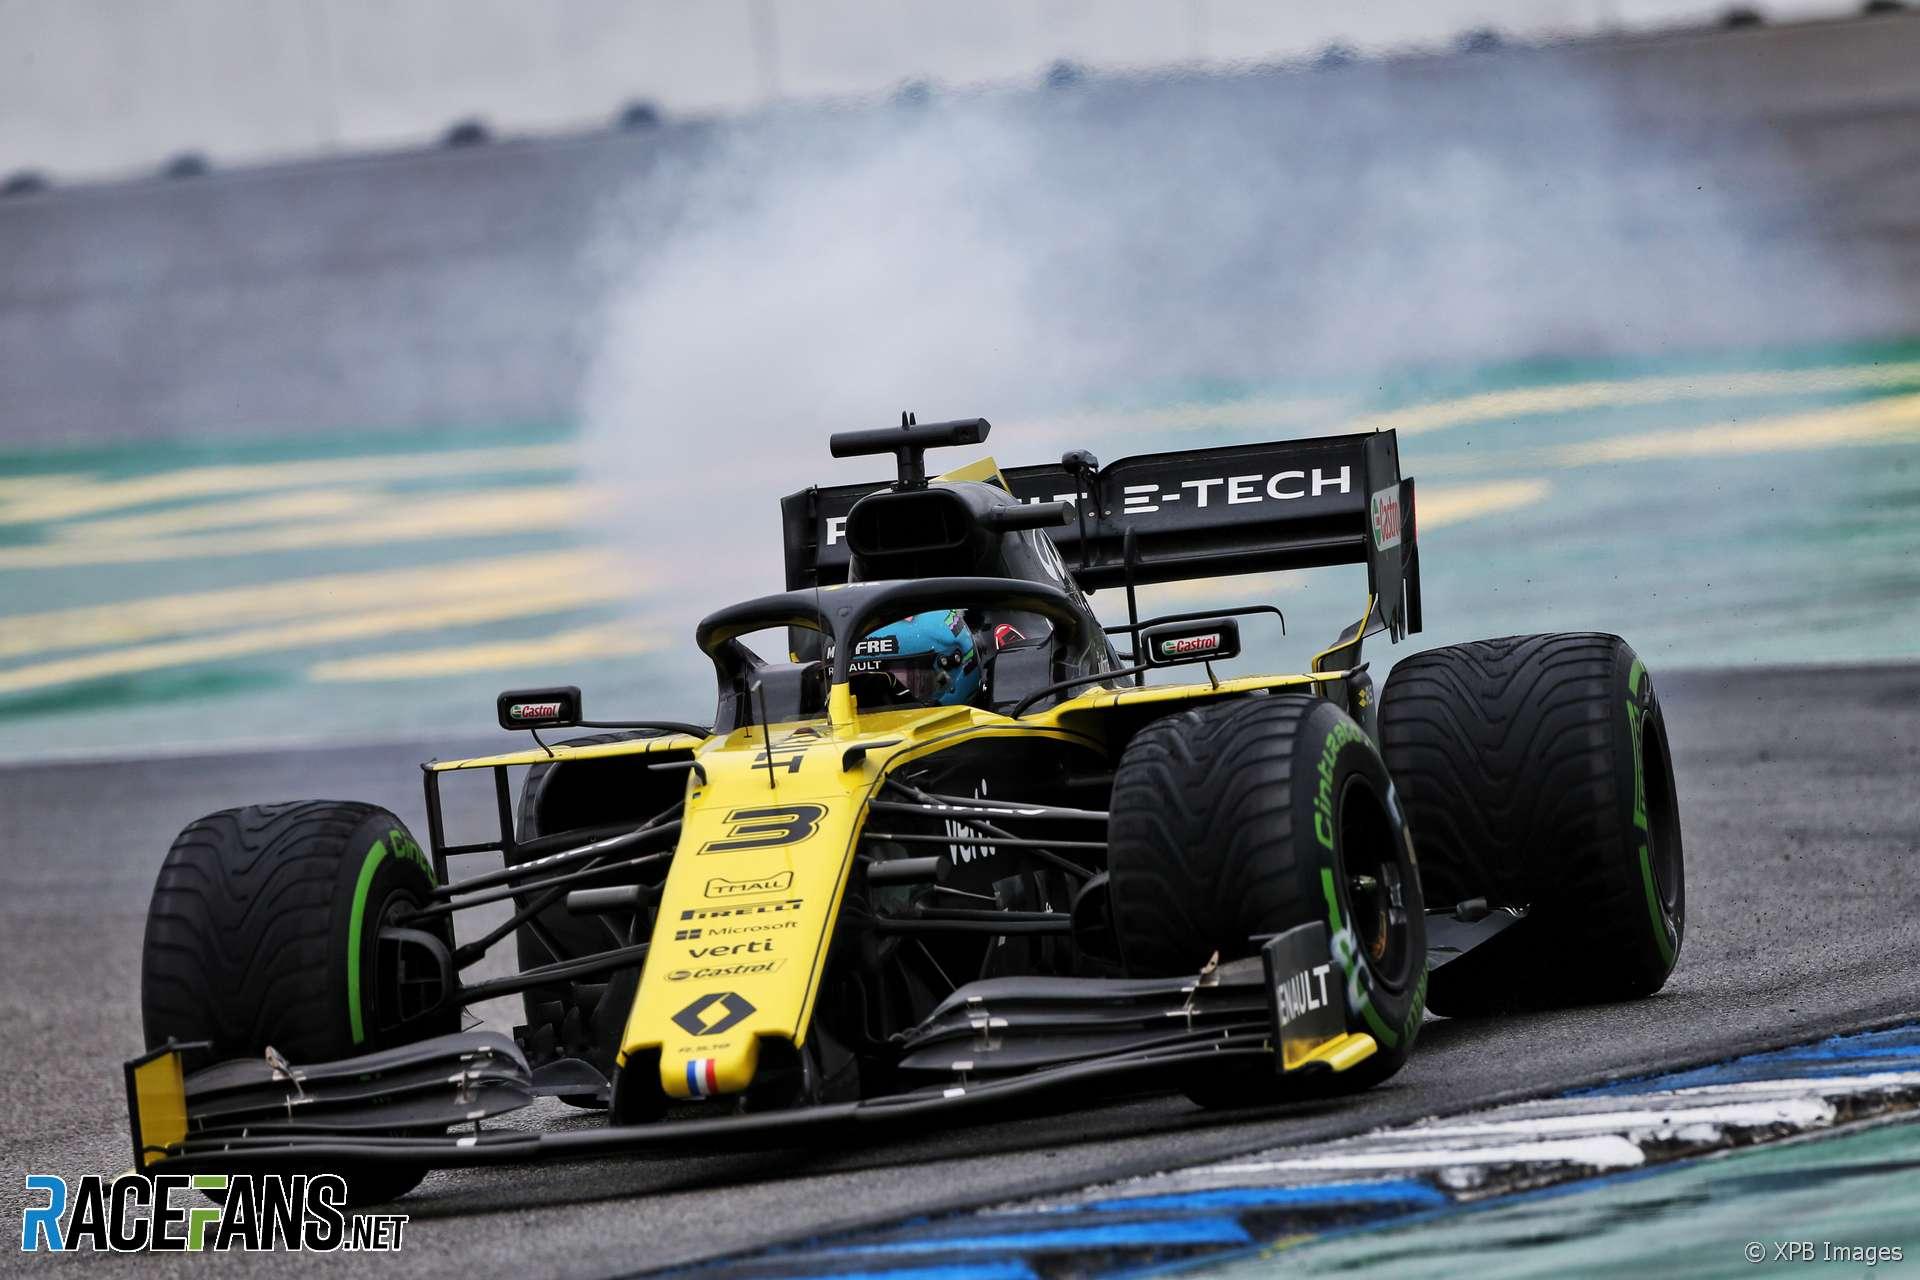 Daniel Ricciardo, Renault, Hockenheimring, 2019